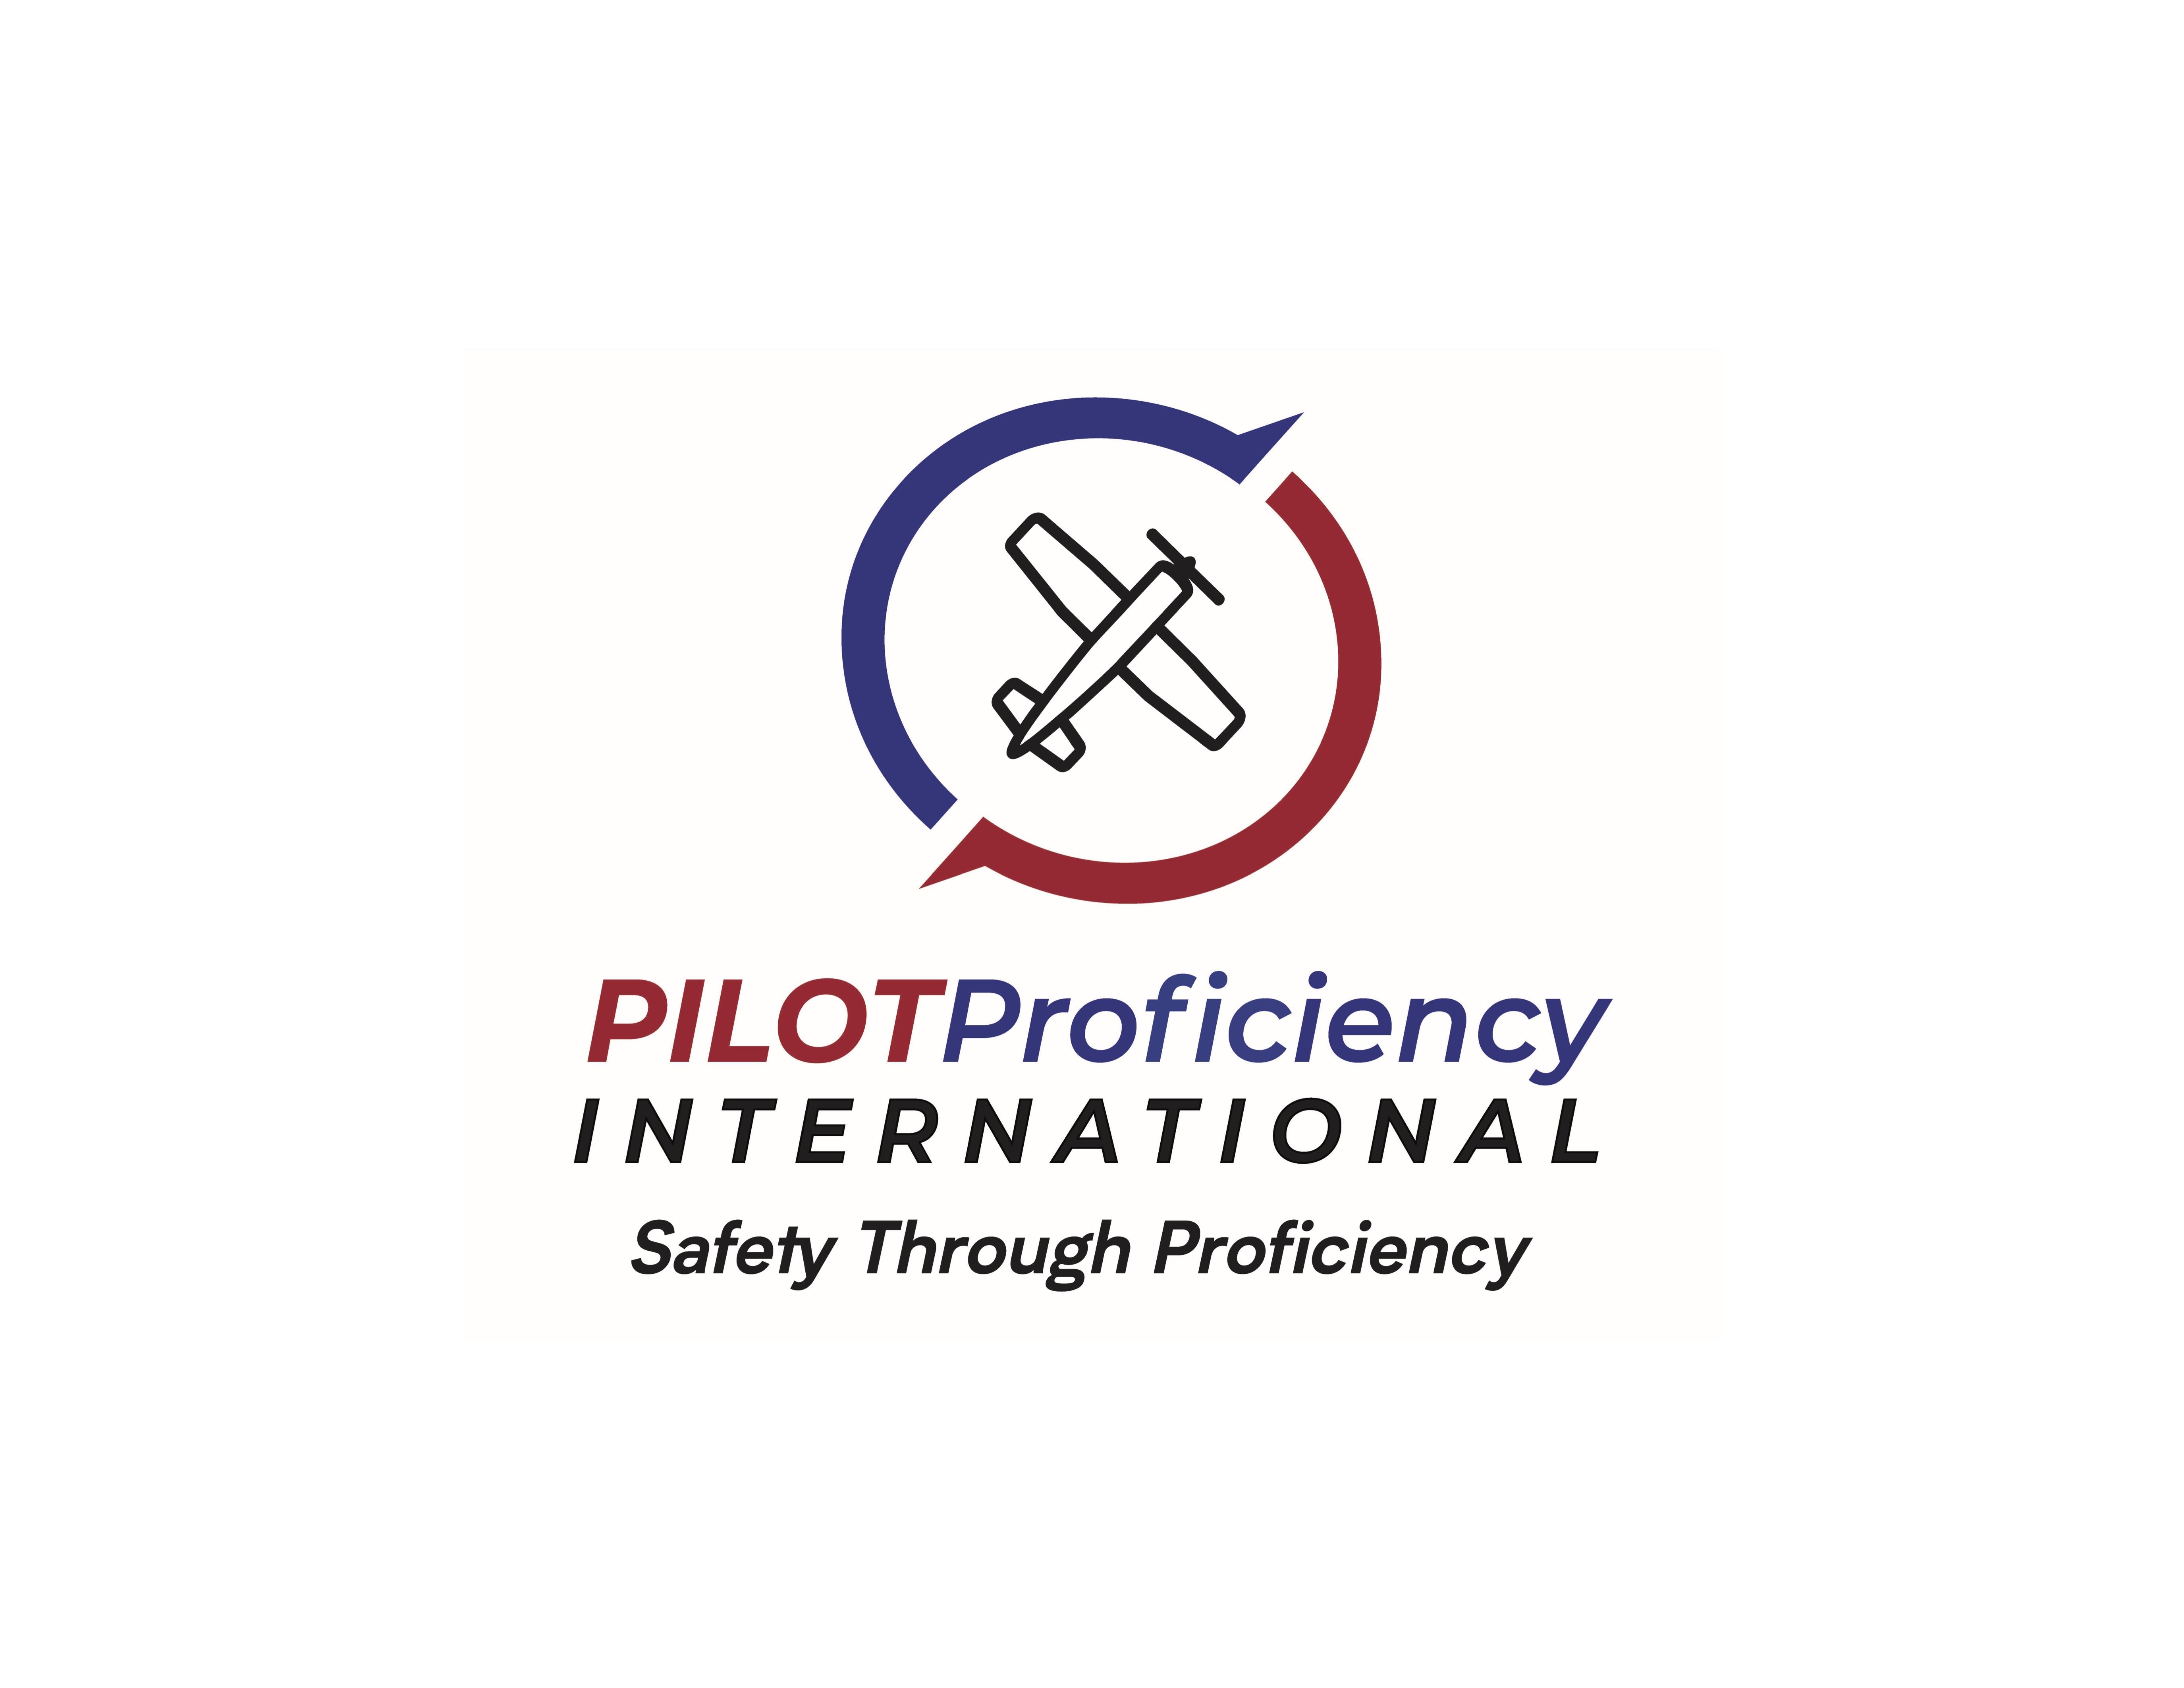 Pilot Proficiency International Logo Dan Weiss Edited